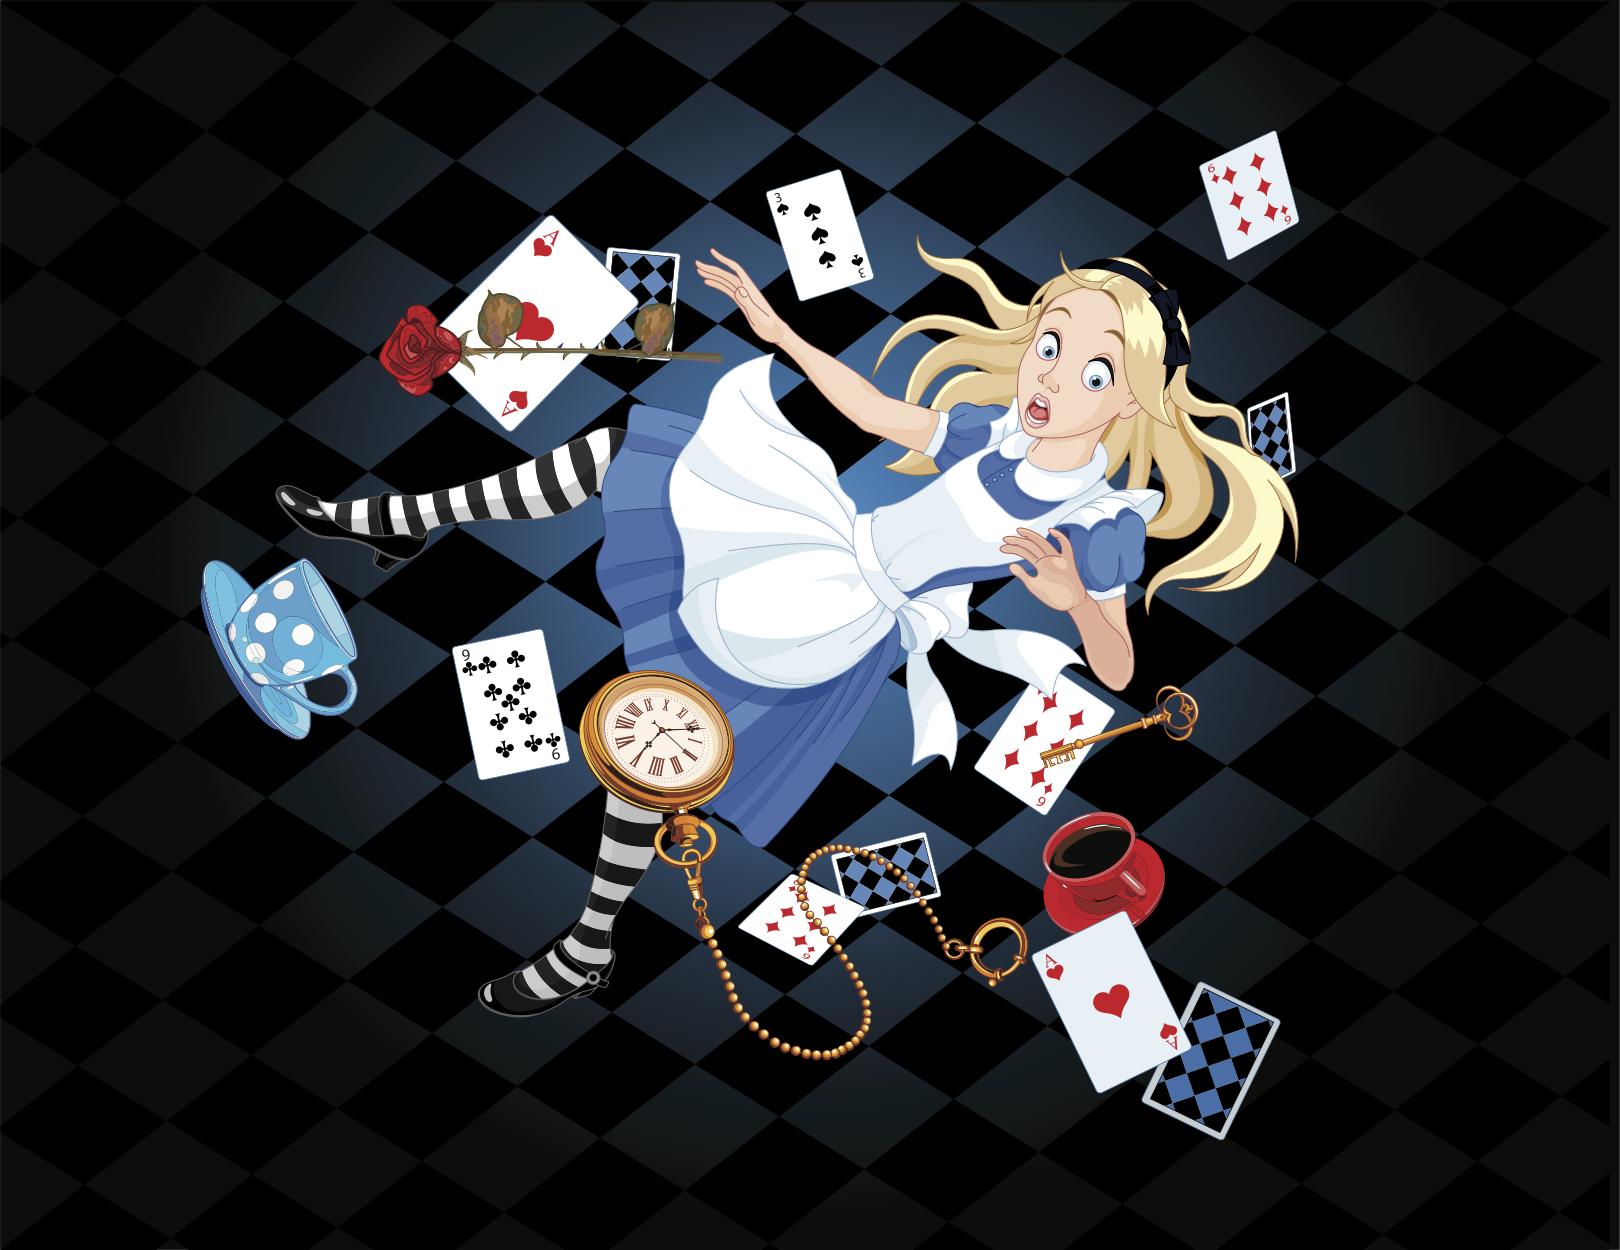 Alice Falling Into the Rabbit Hole